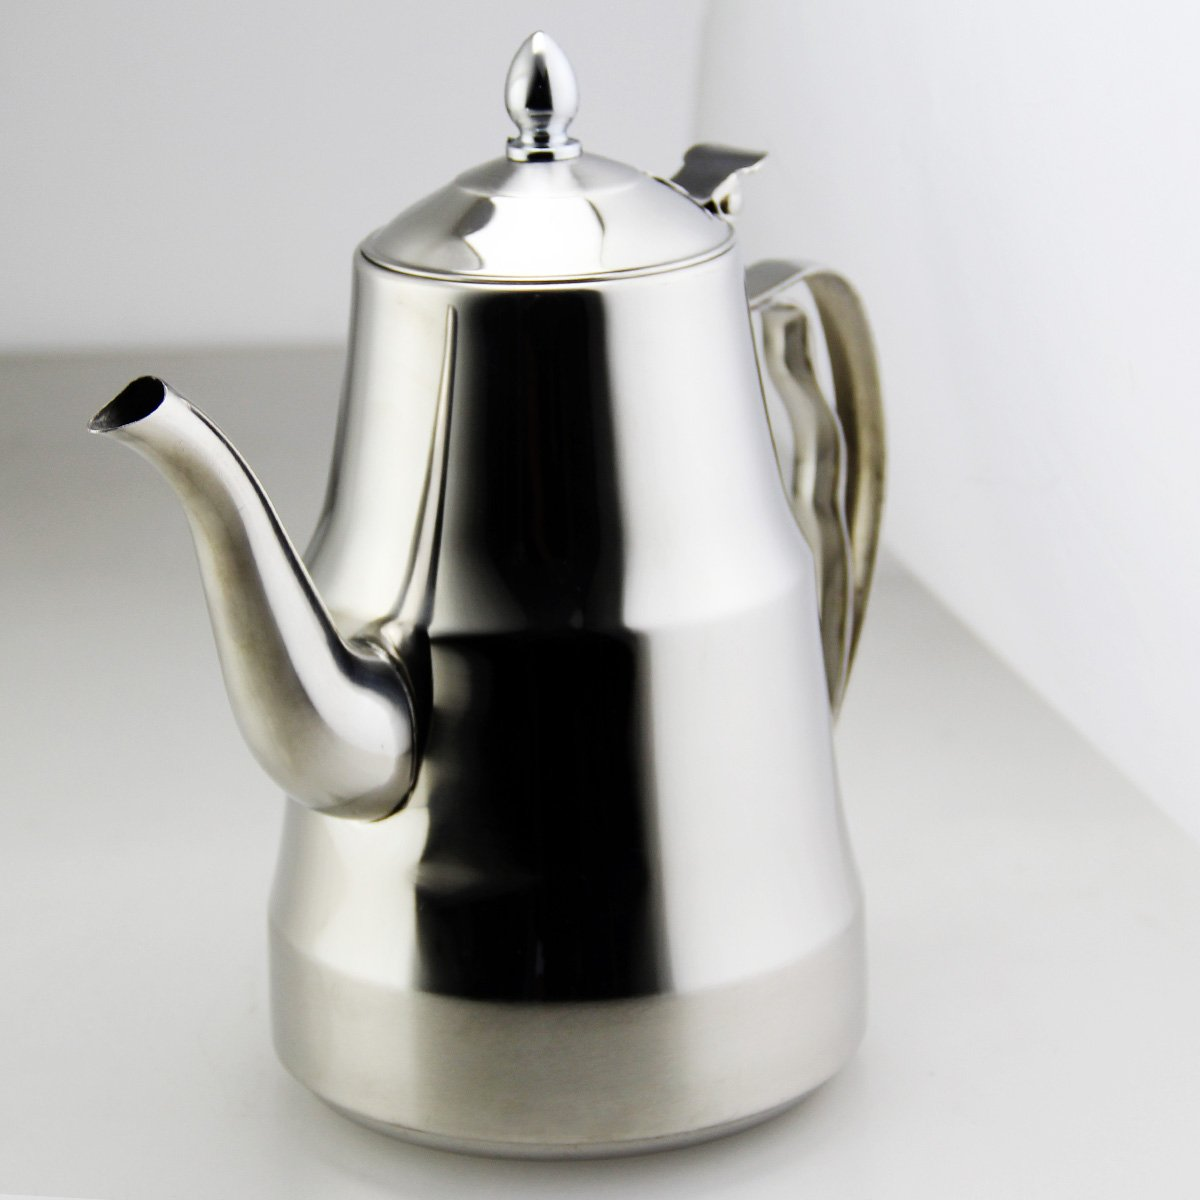 GS-028212-2.0L Riwendell Stainless Steel Mirror Finish Tea Kettle Stovetop Tea Pot 2.1-Quart